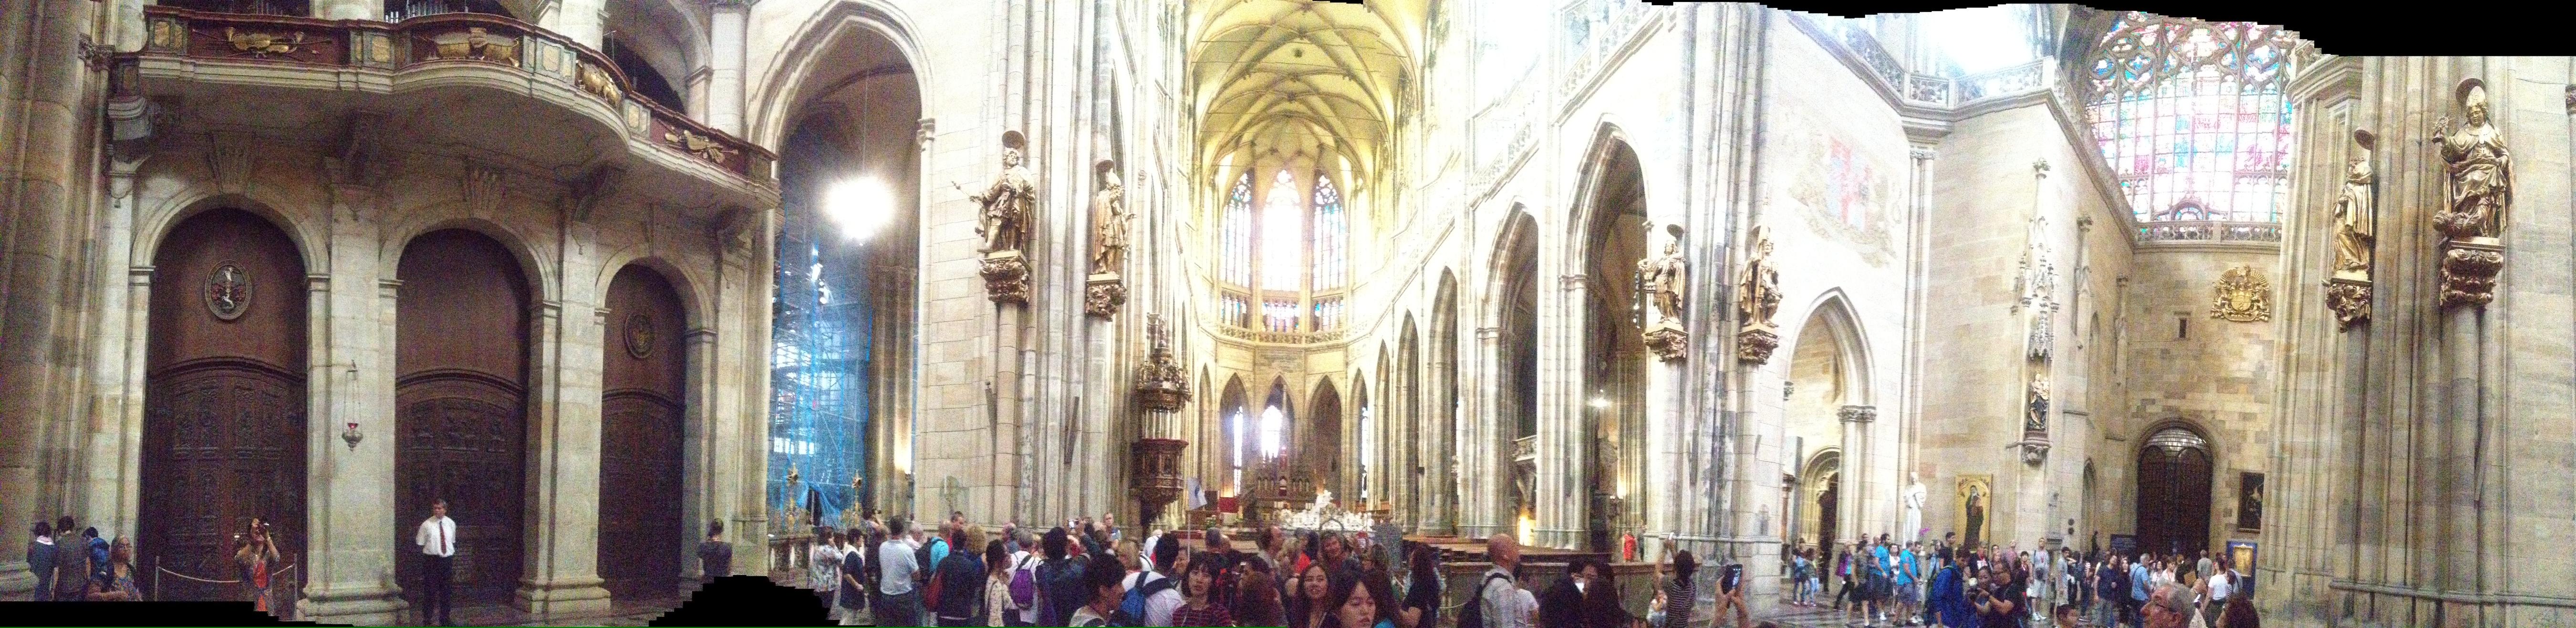 St. Vitas Church, Prague Castle